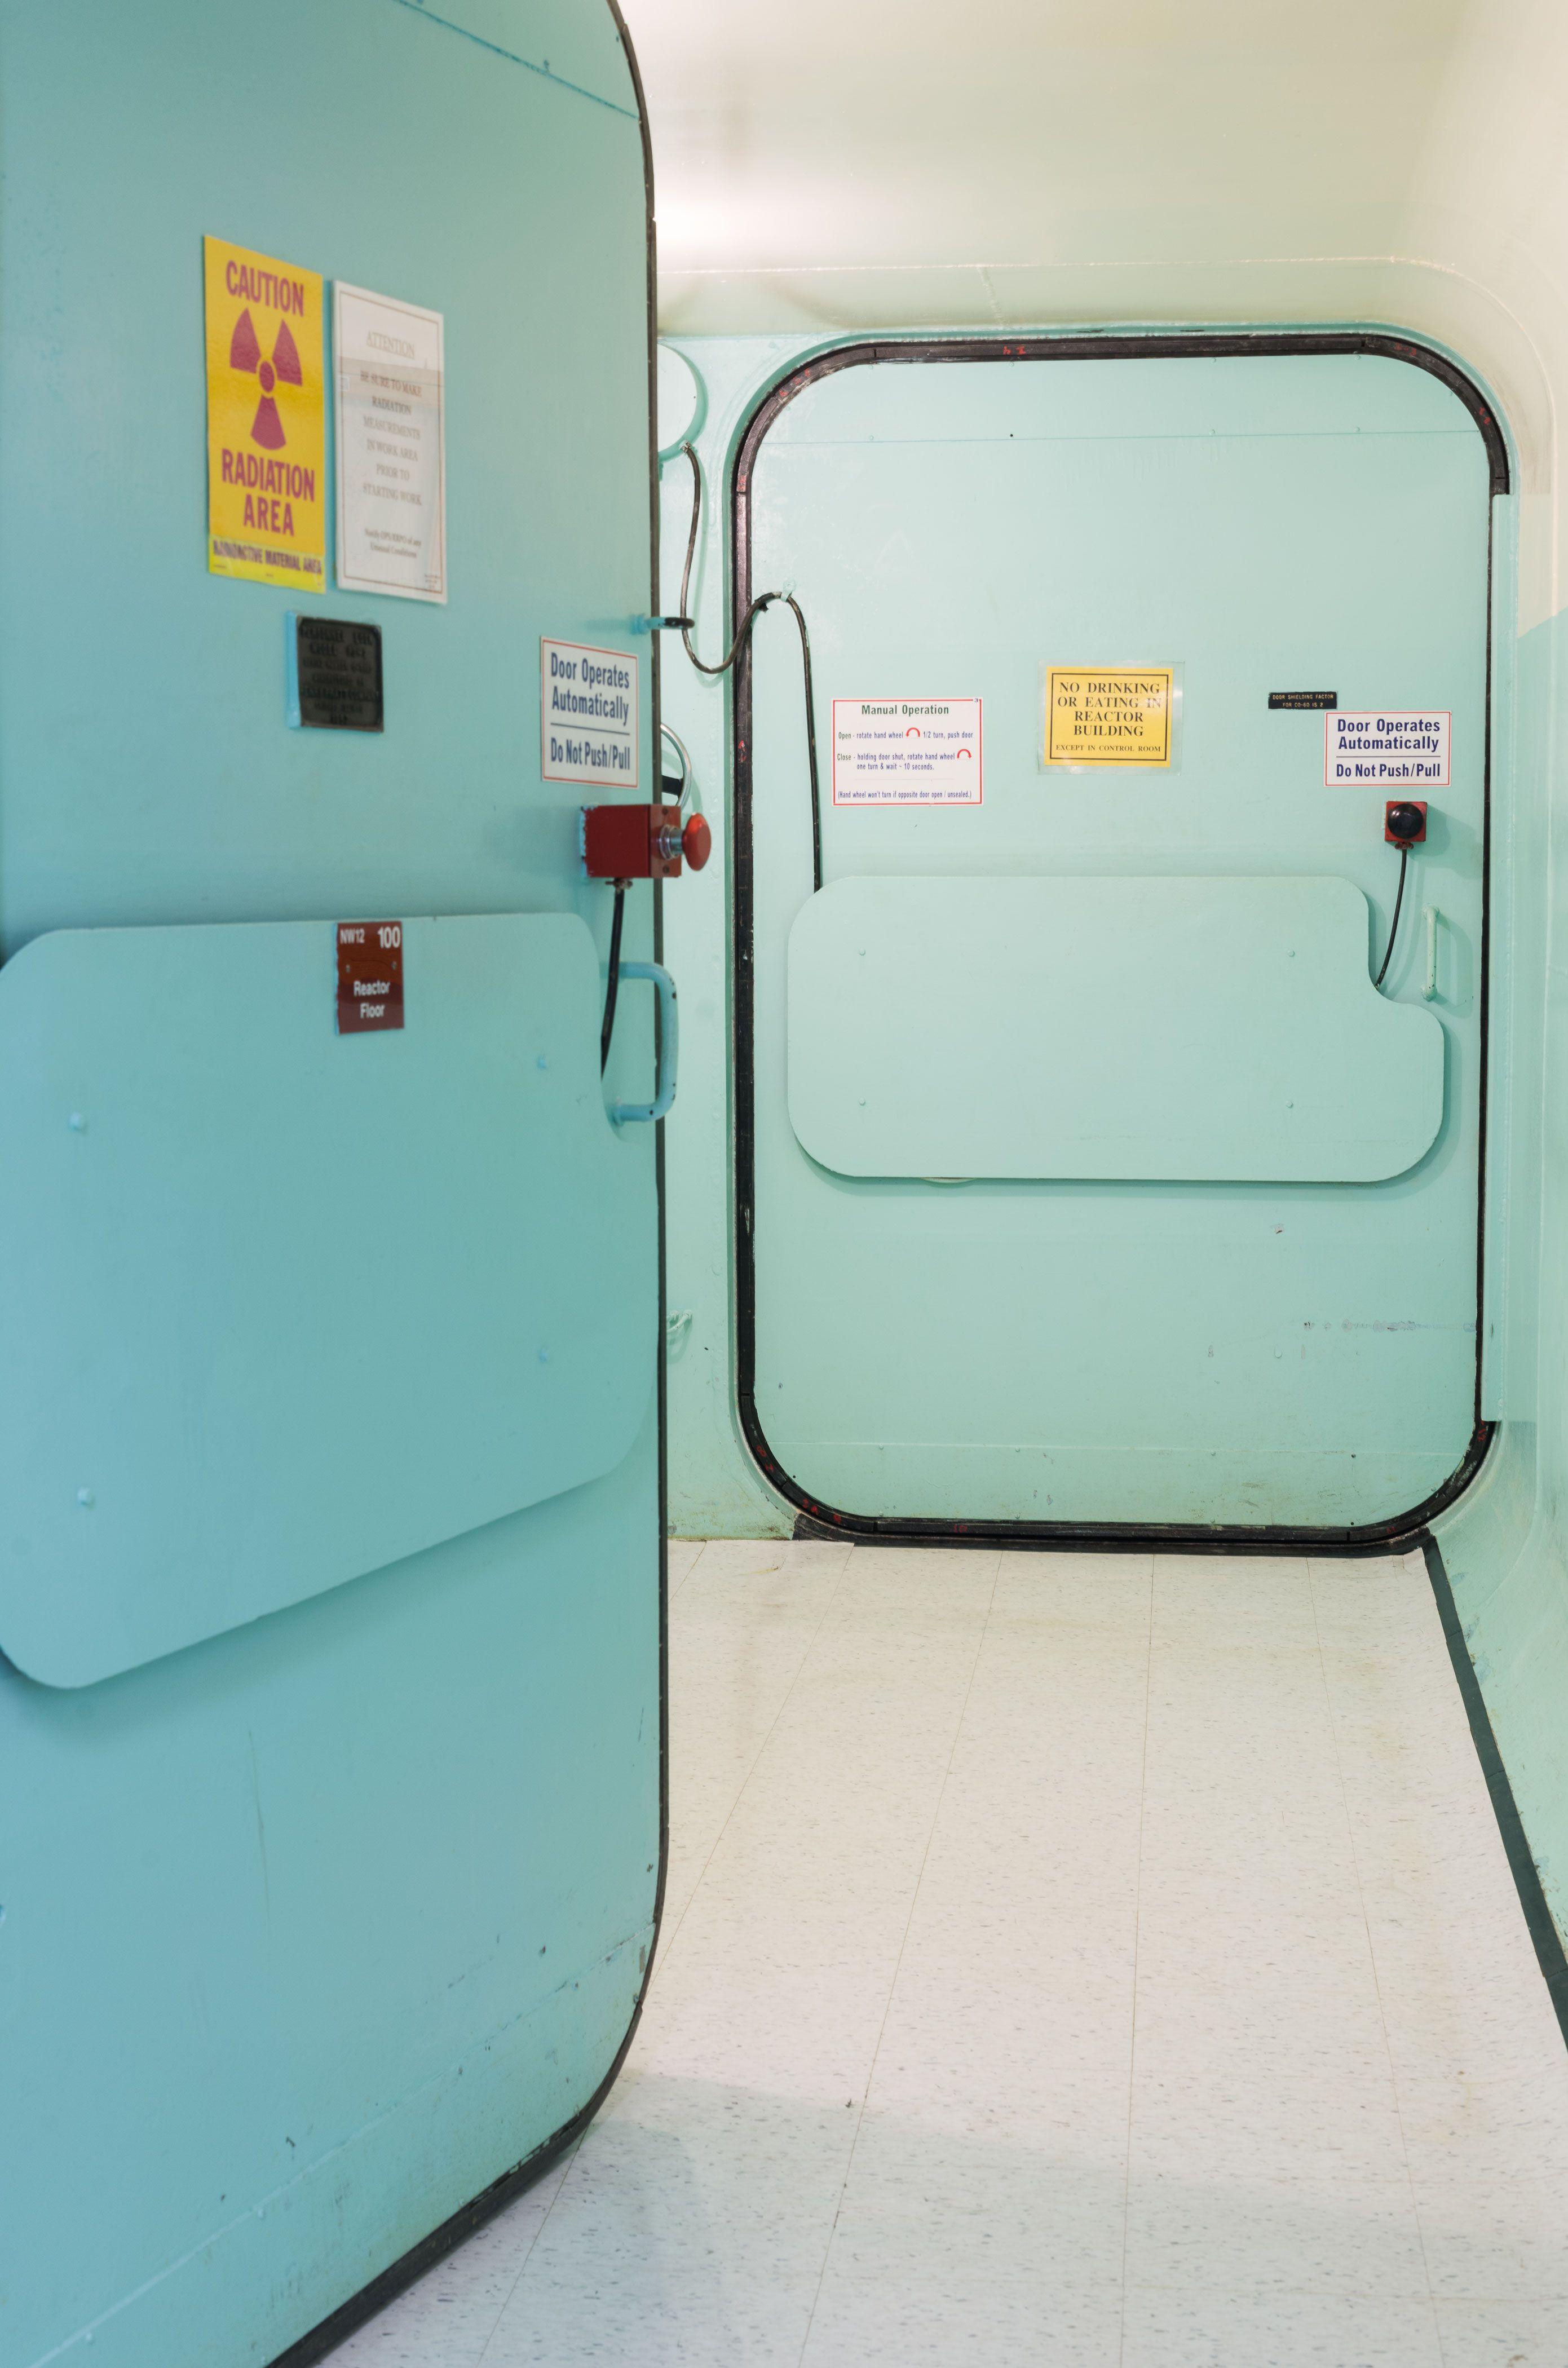 MITが 次世代原子炉の 研究を再開